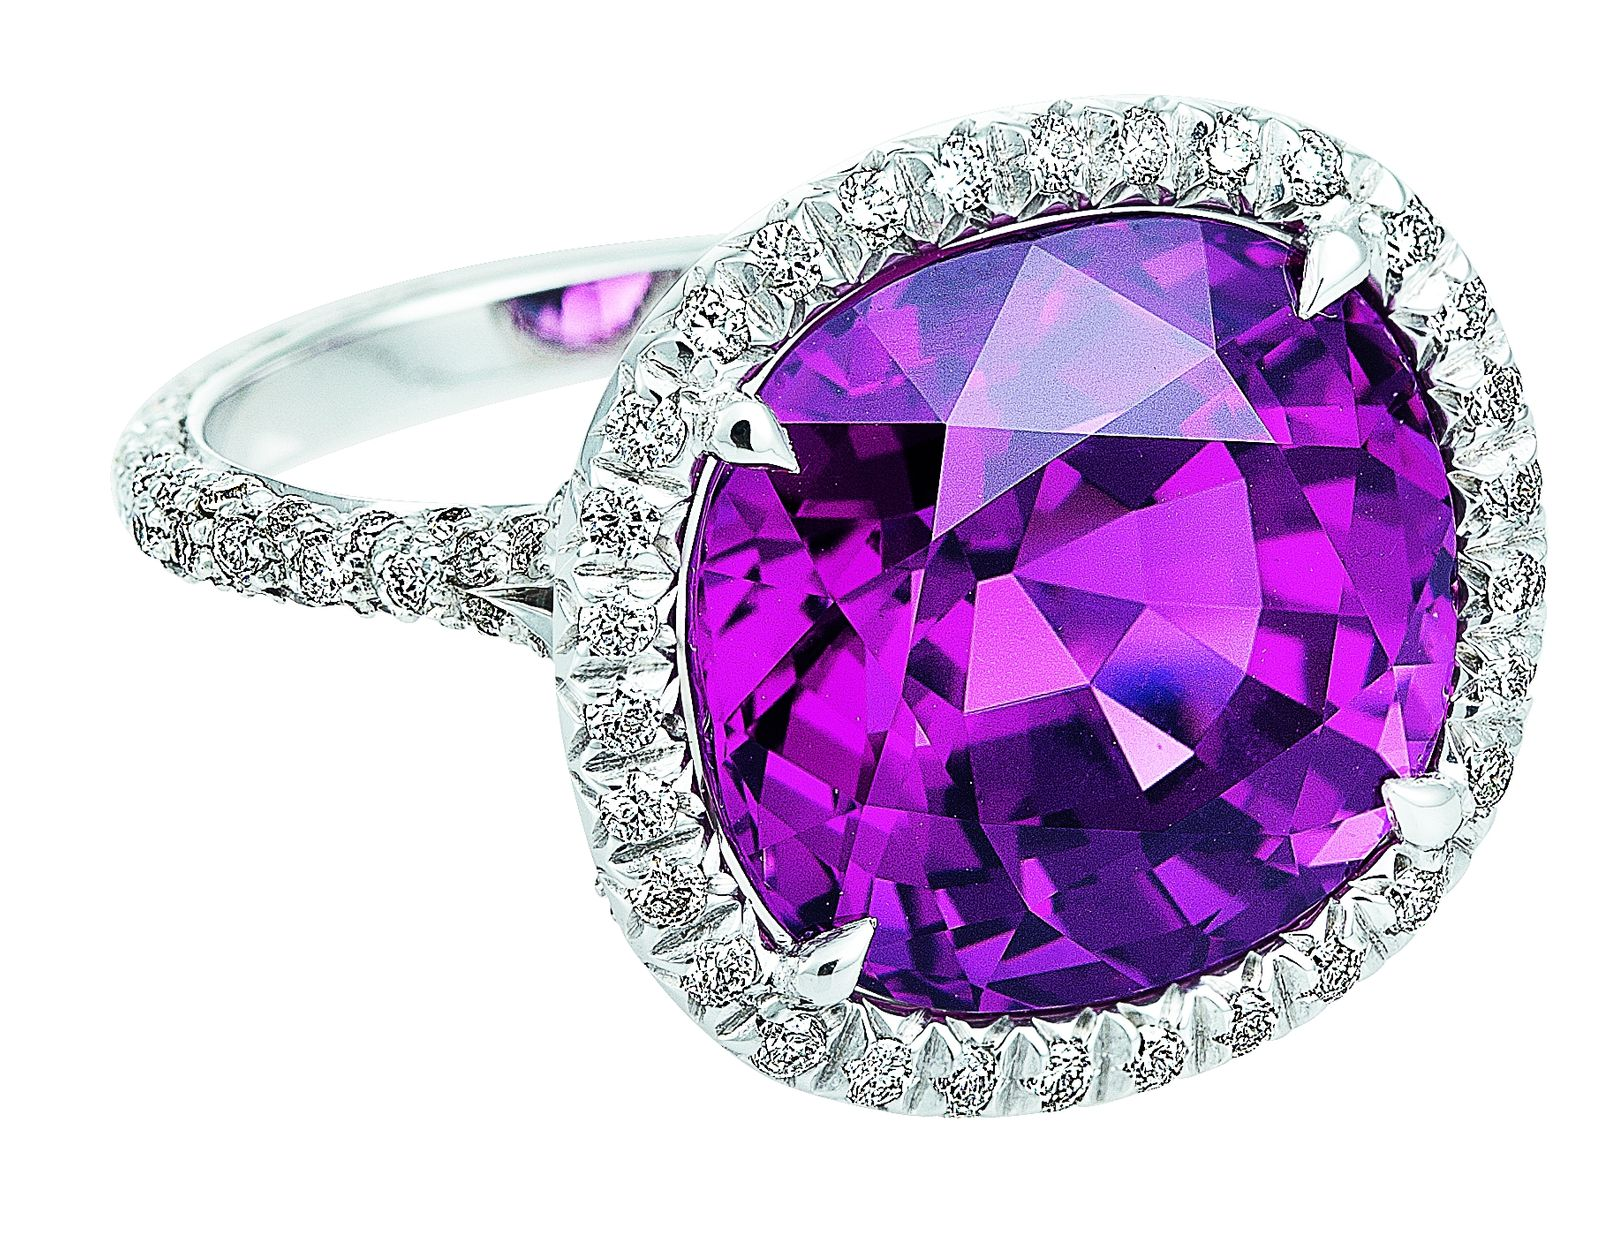 Köchert Juweliere